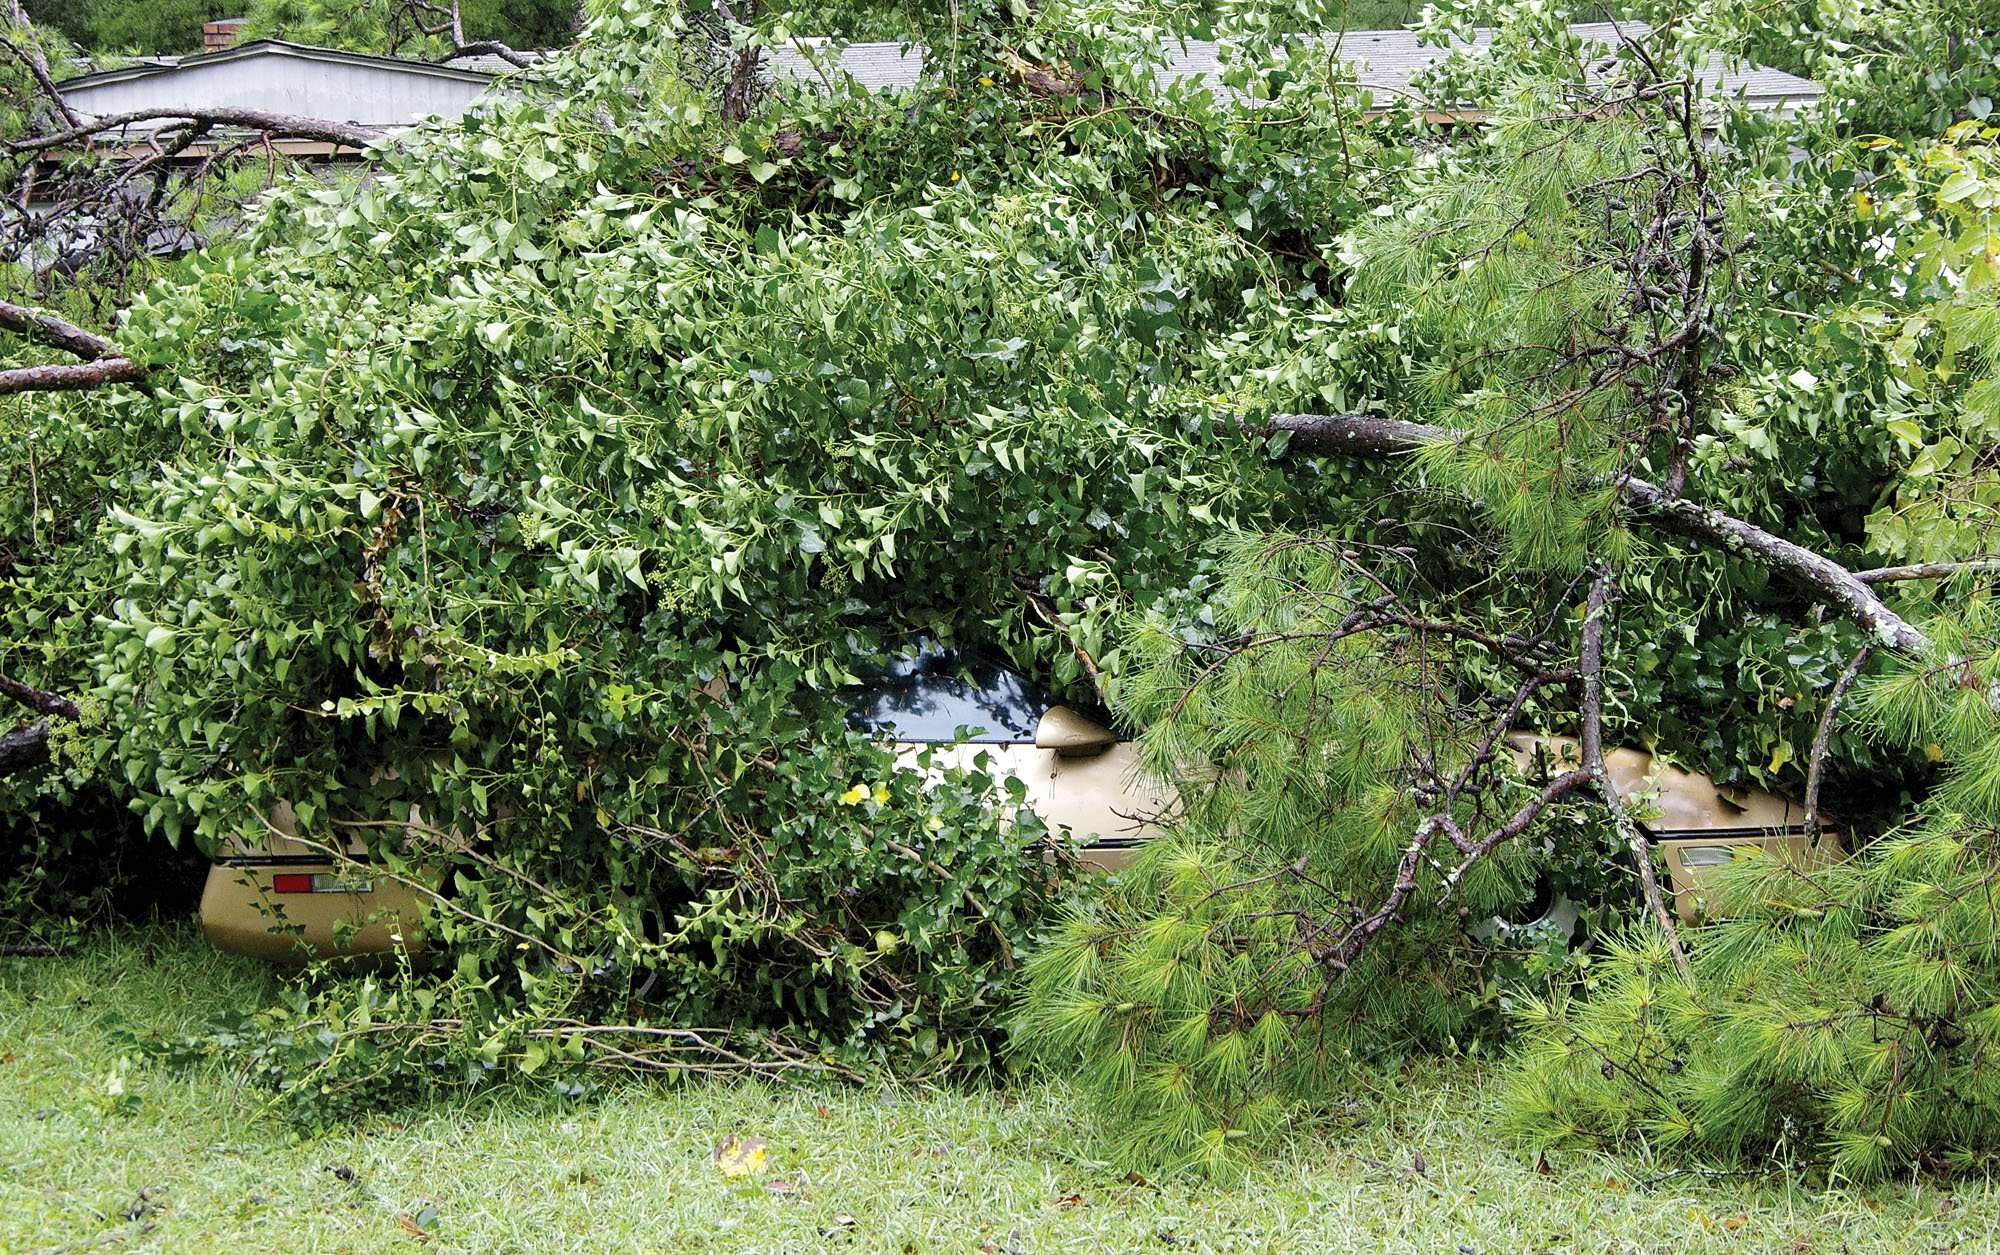 Corvette damaged by tree